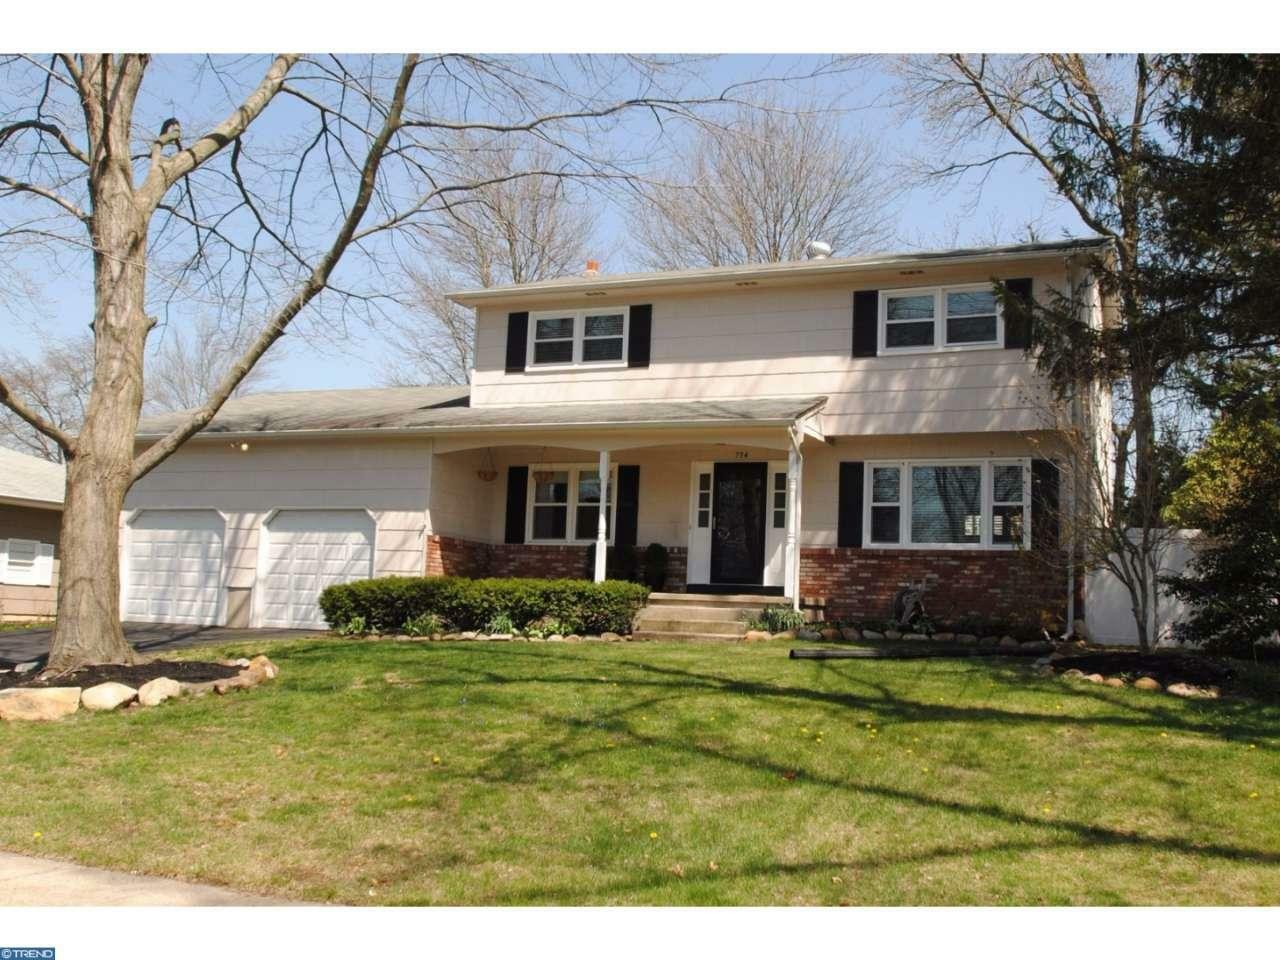 794 Estates Blvd, Hamilton, NJ - USA (photo 1)